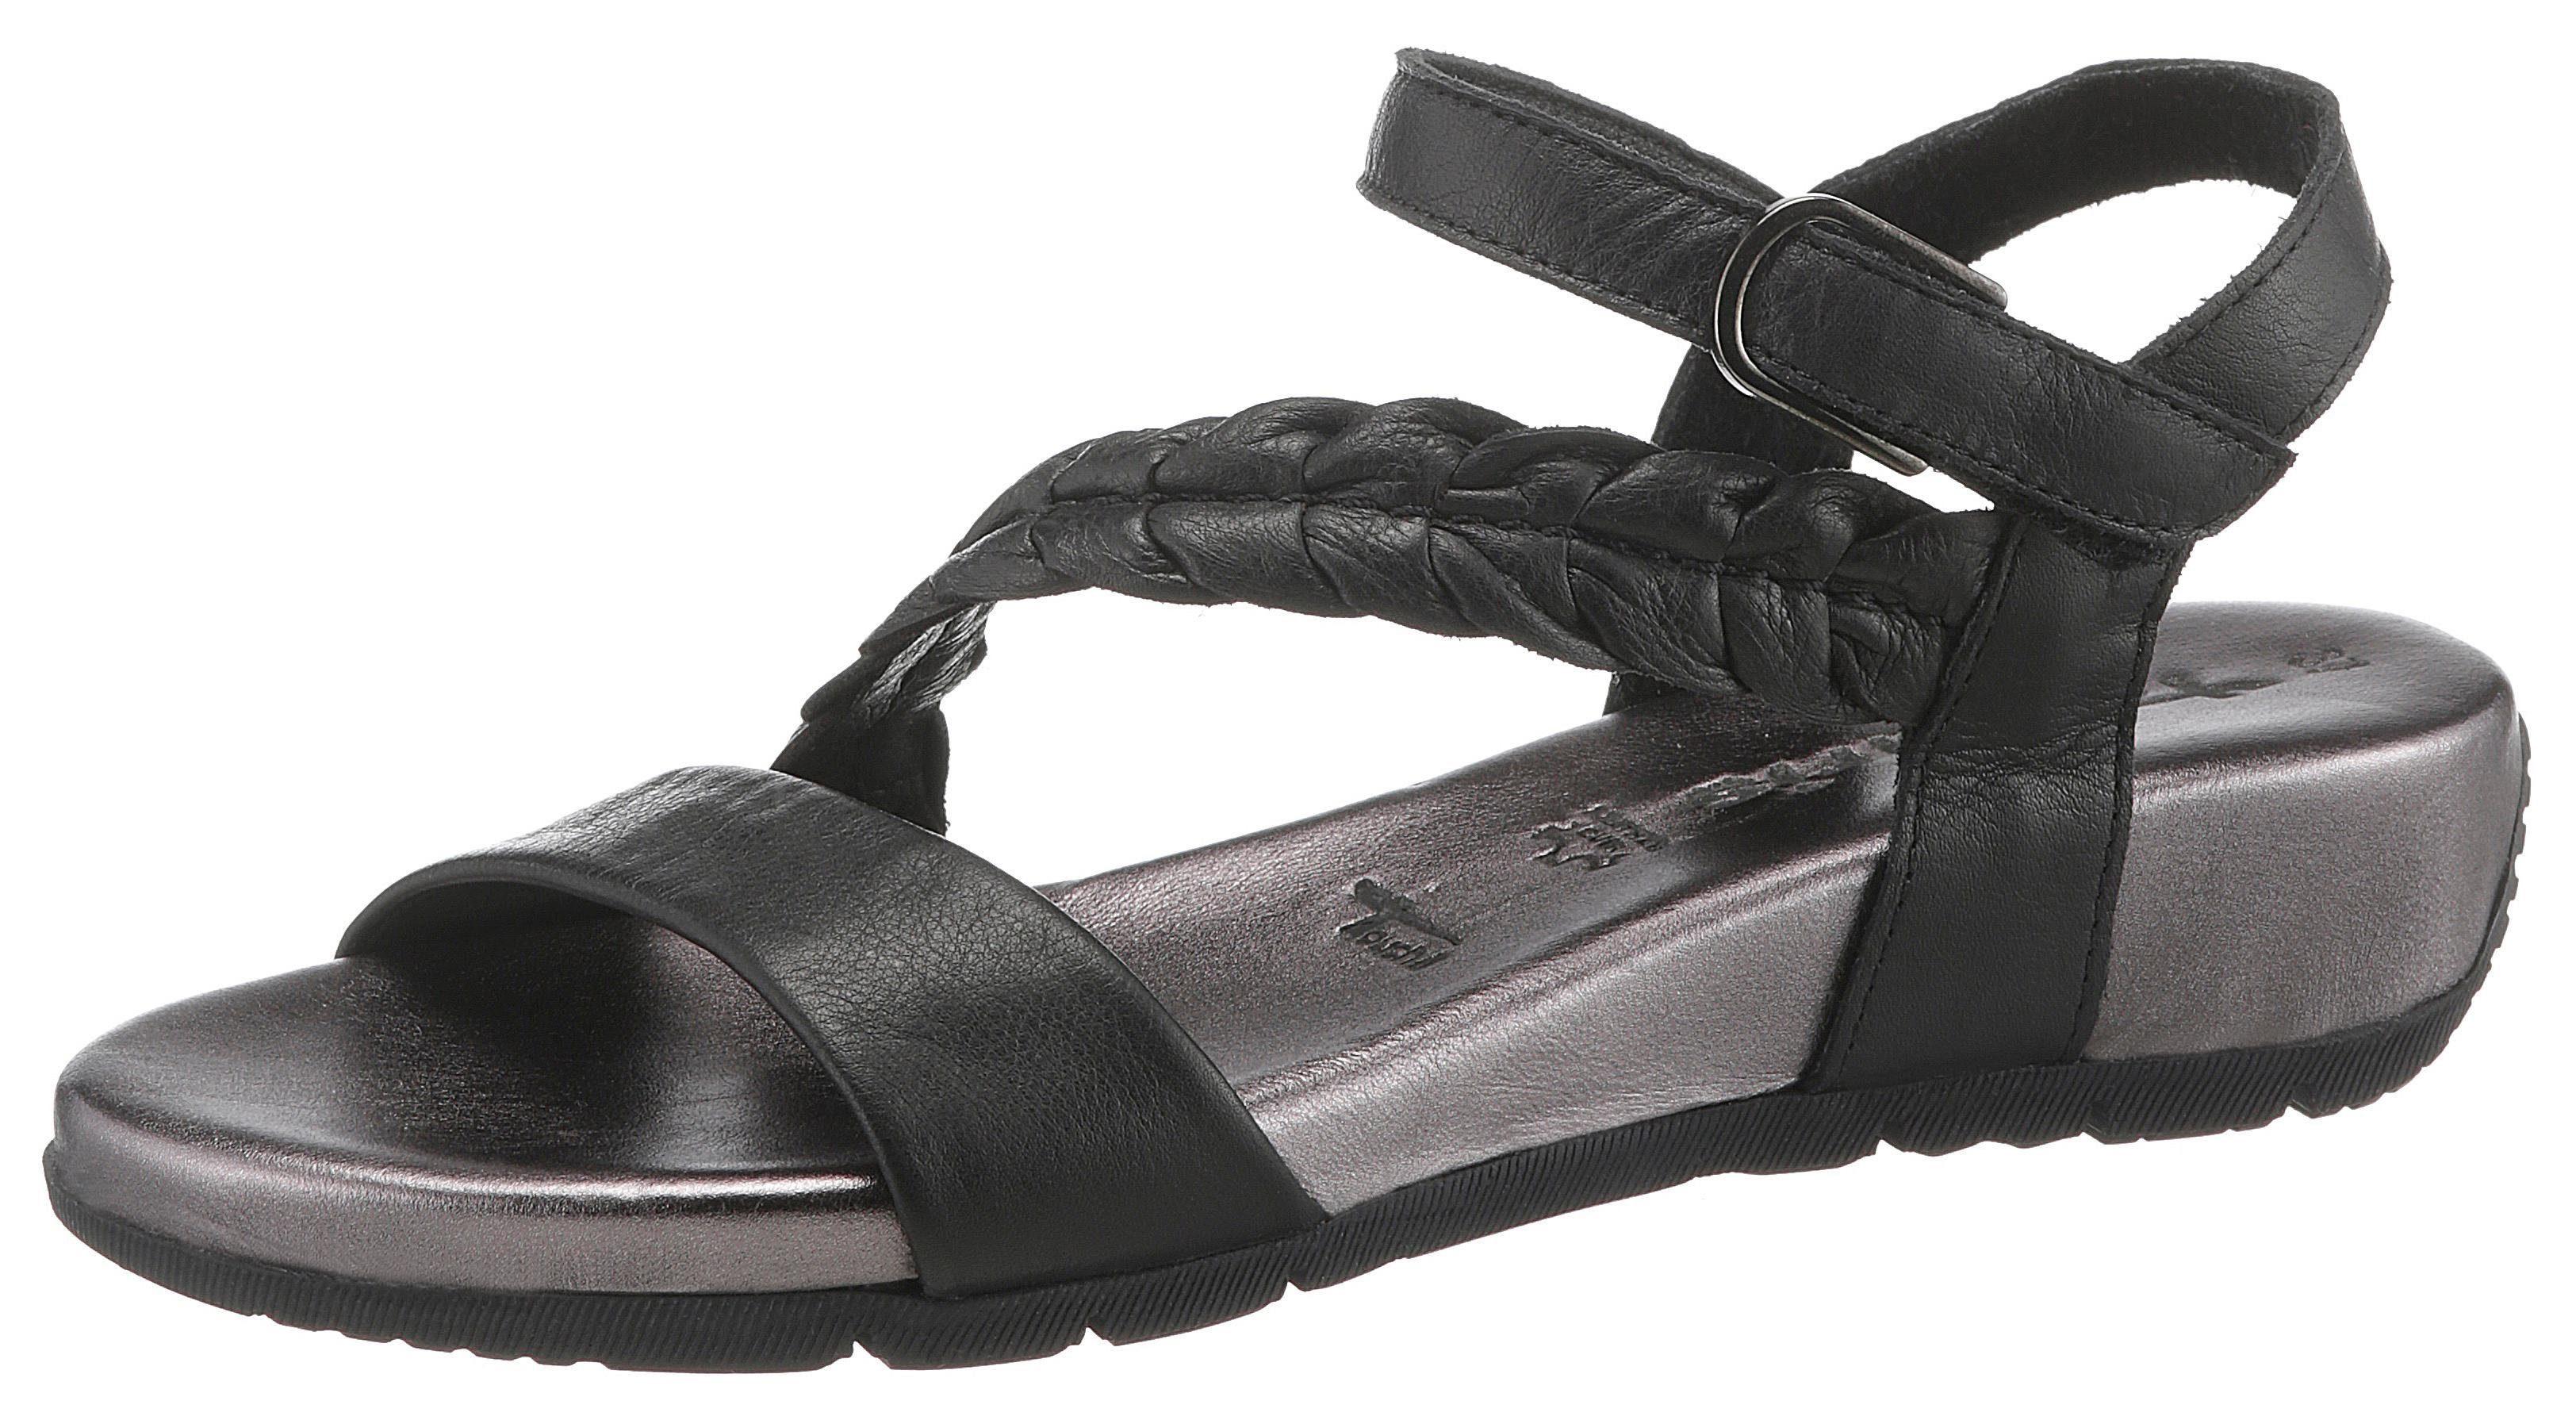 Tamaris »Miki« Sandalette mit hochgezogener Fersenkappe